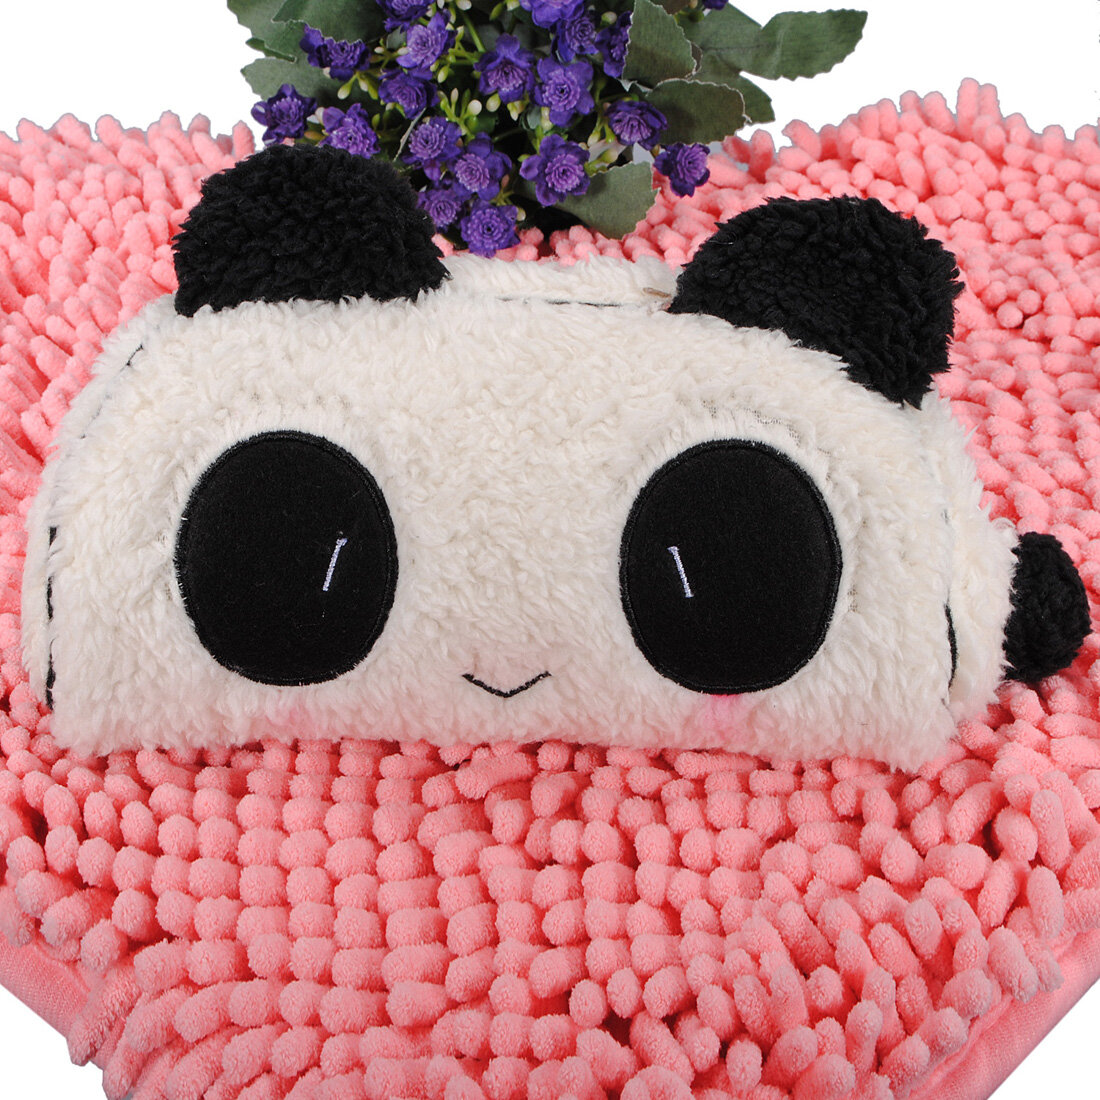 Panda Soft Plush Pencil Makeup Zipper Bag Case Pen Pocket Soft Plush Cosmetic Pouch Gift